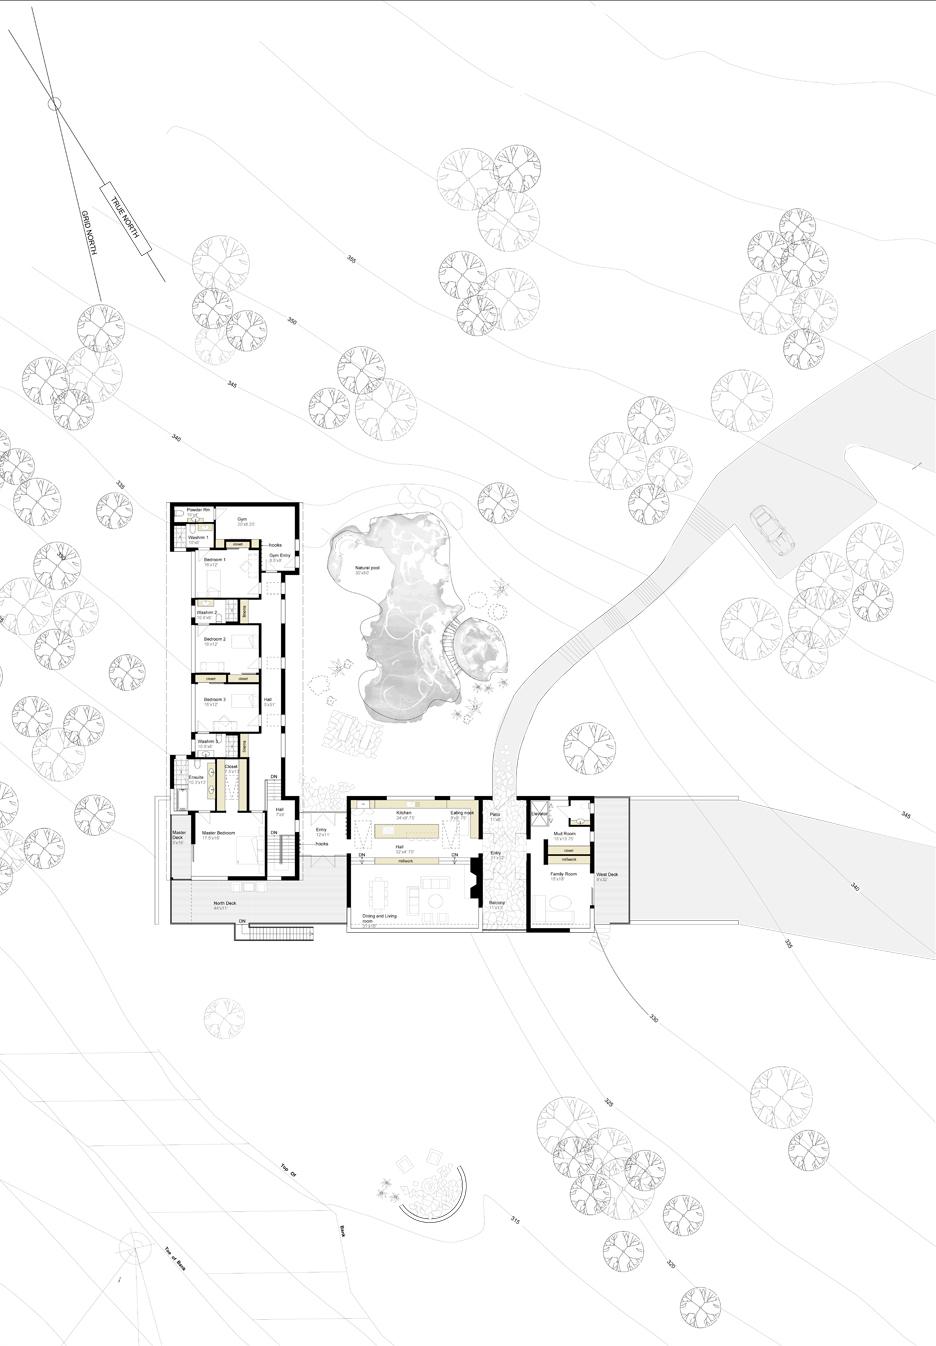 houdinidesign_ARCHITECTS_Process_Concept_Plan_02.jpg